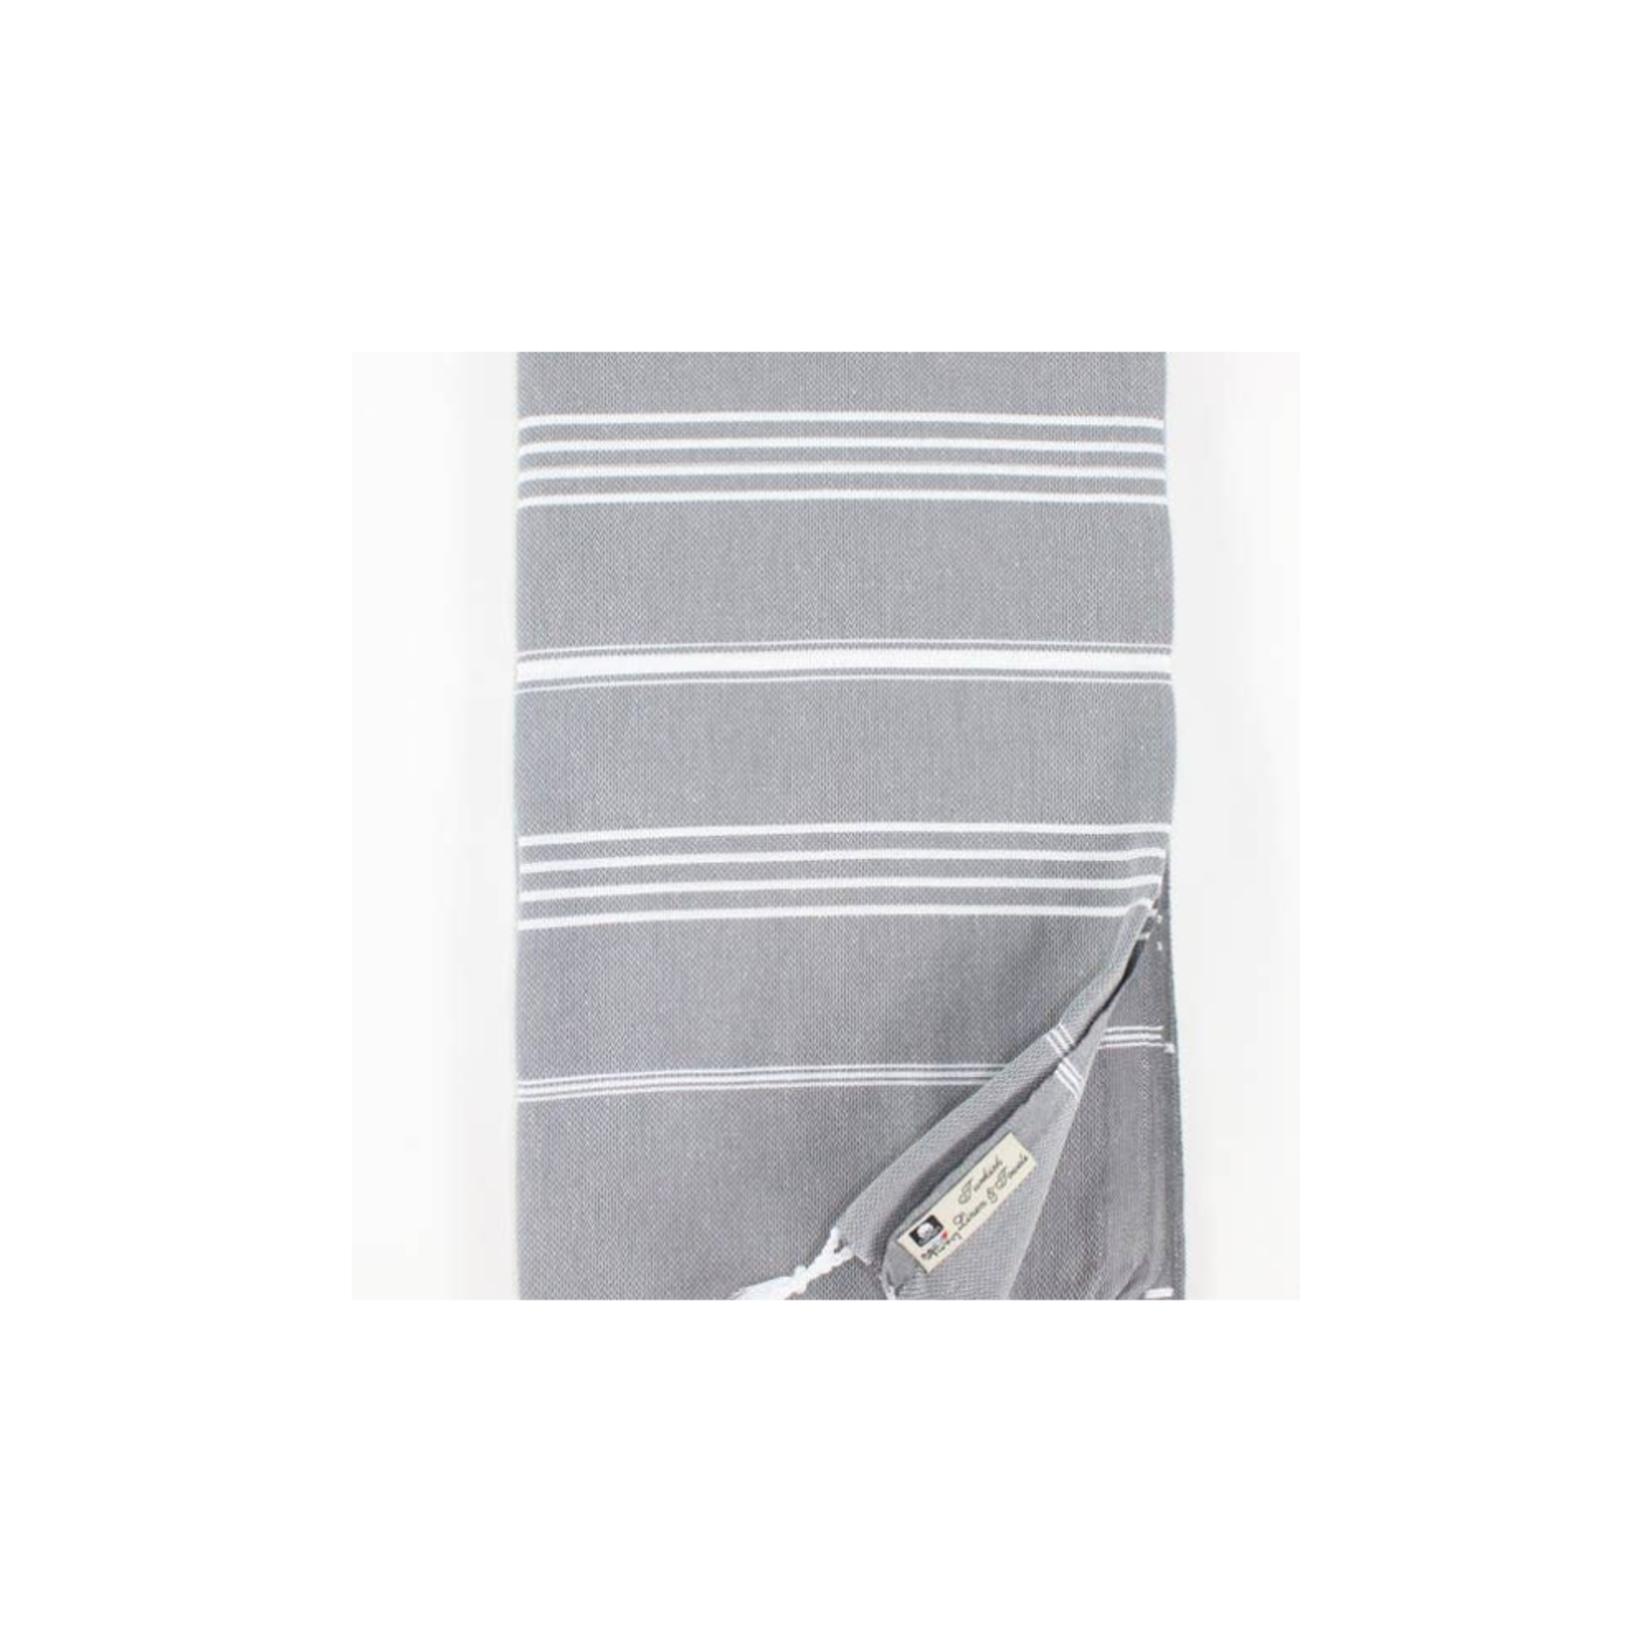 Premium Turkish Peshtemal Towel: Gray